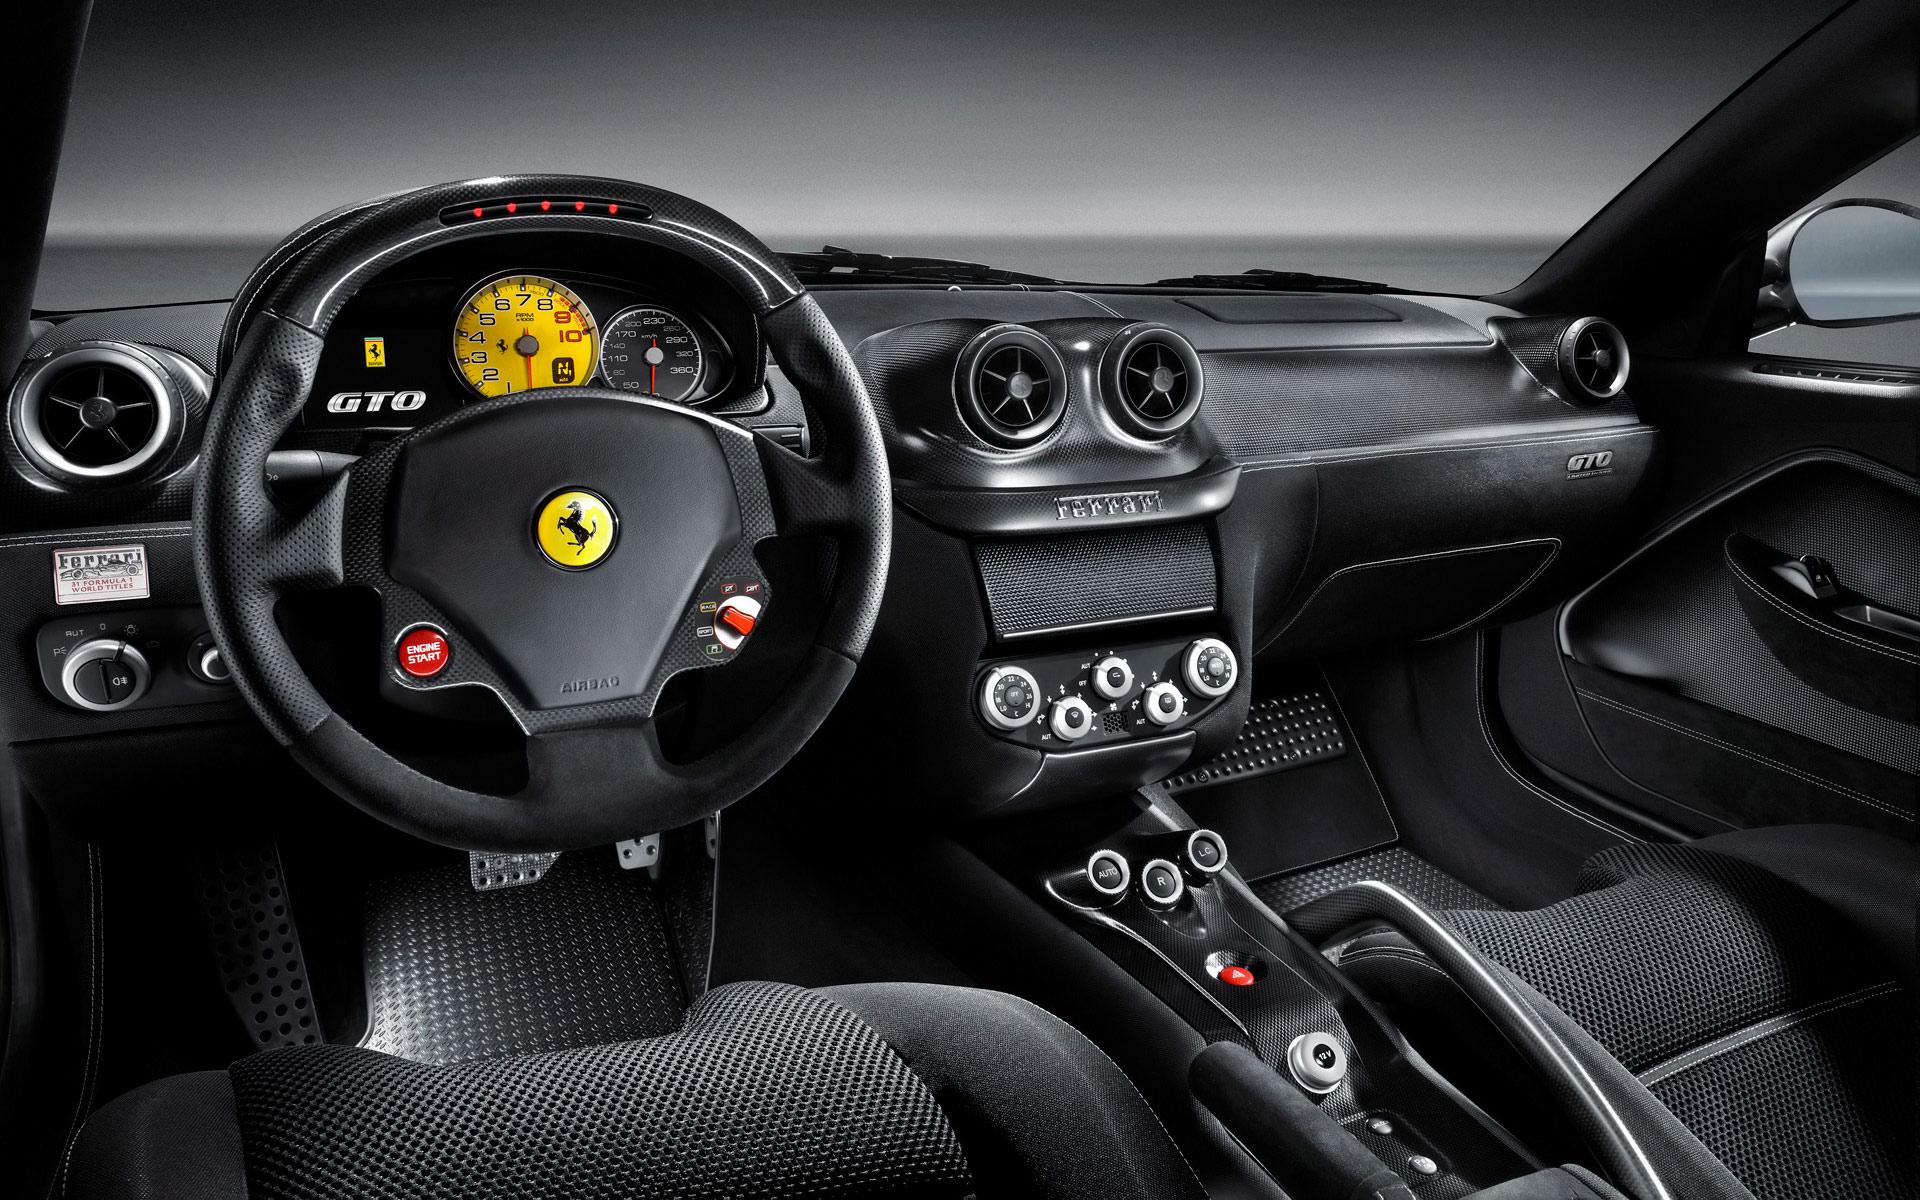 Ferrari interior wallpaper hd 45800 1920x1200 px for Wallpaper home interior 2015